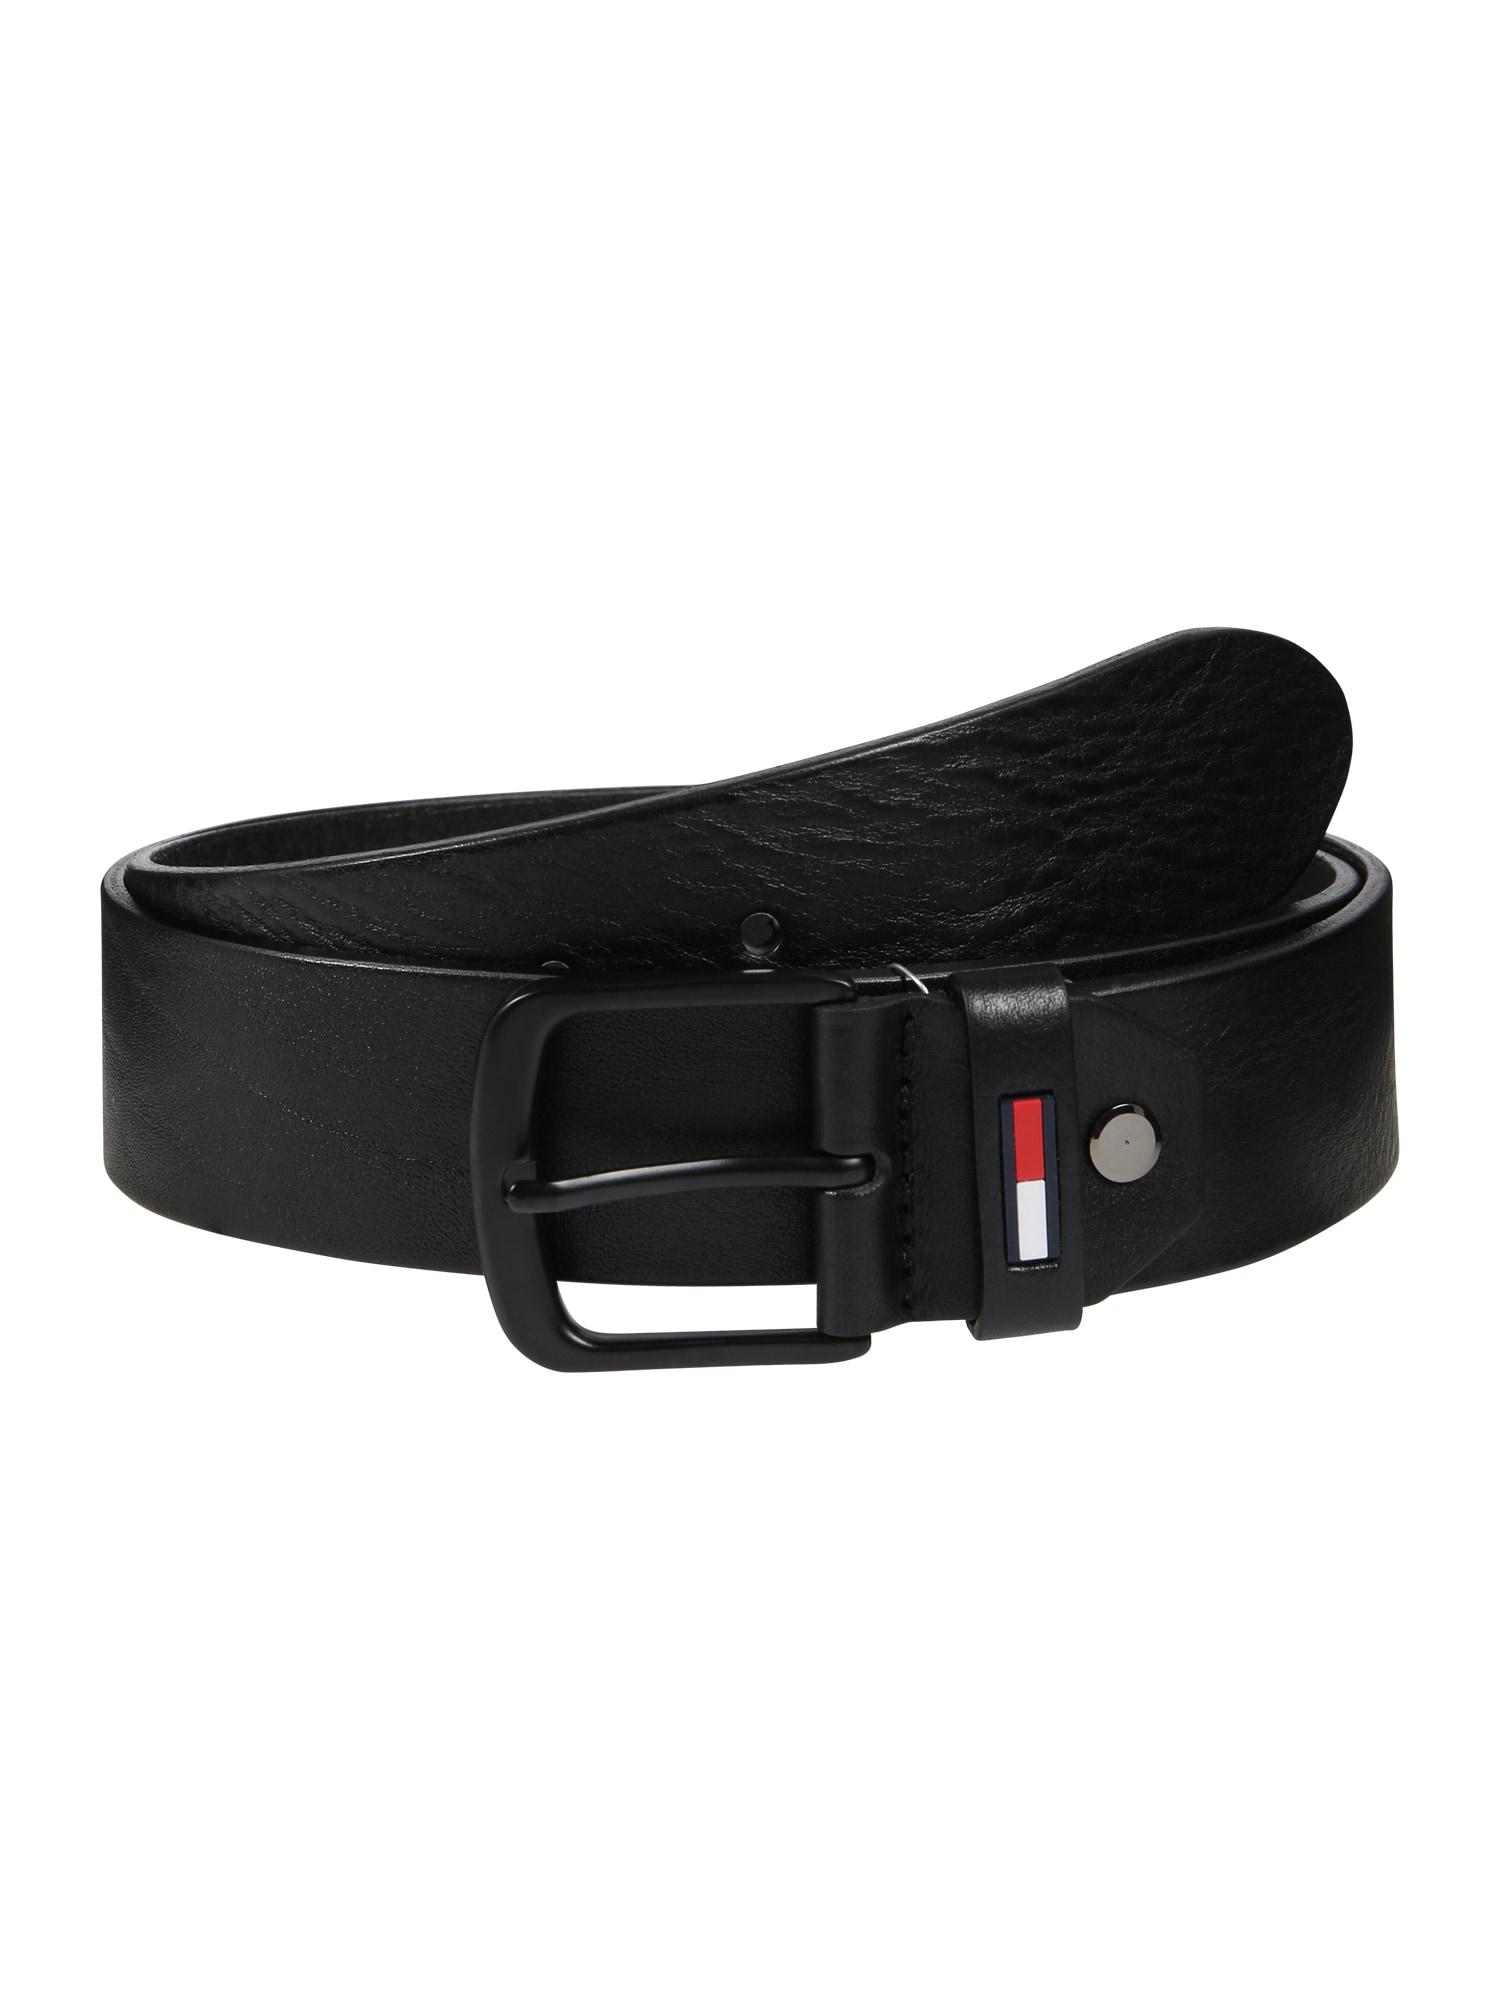 Opasek TJM Flag Loop Belt 4.0 ADJ černá Tommy Jeans